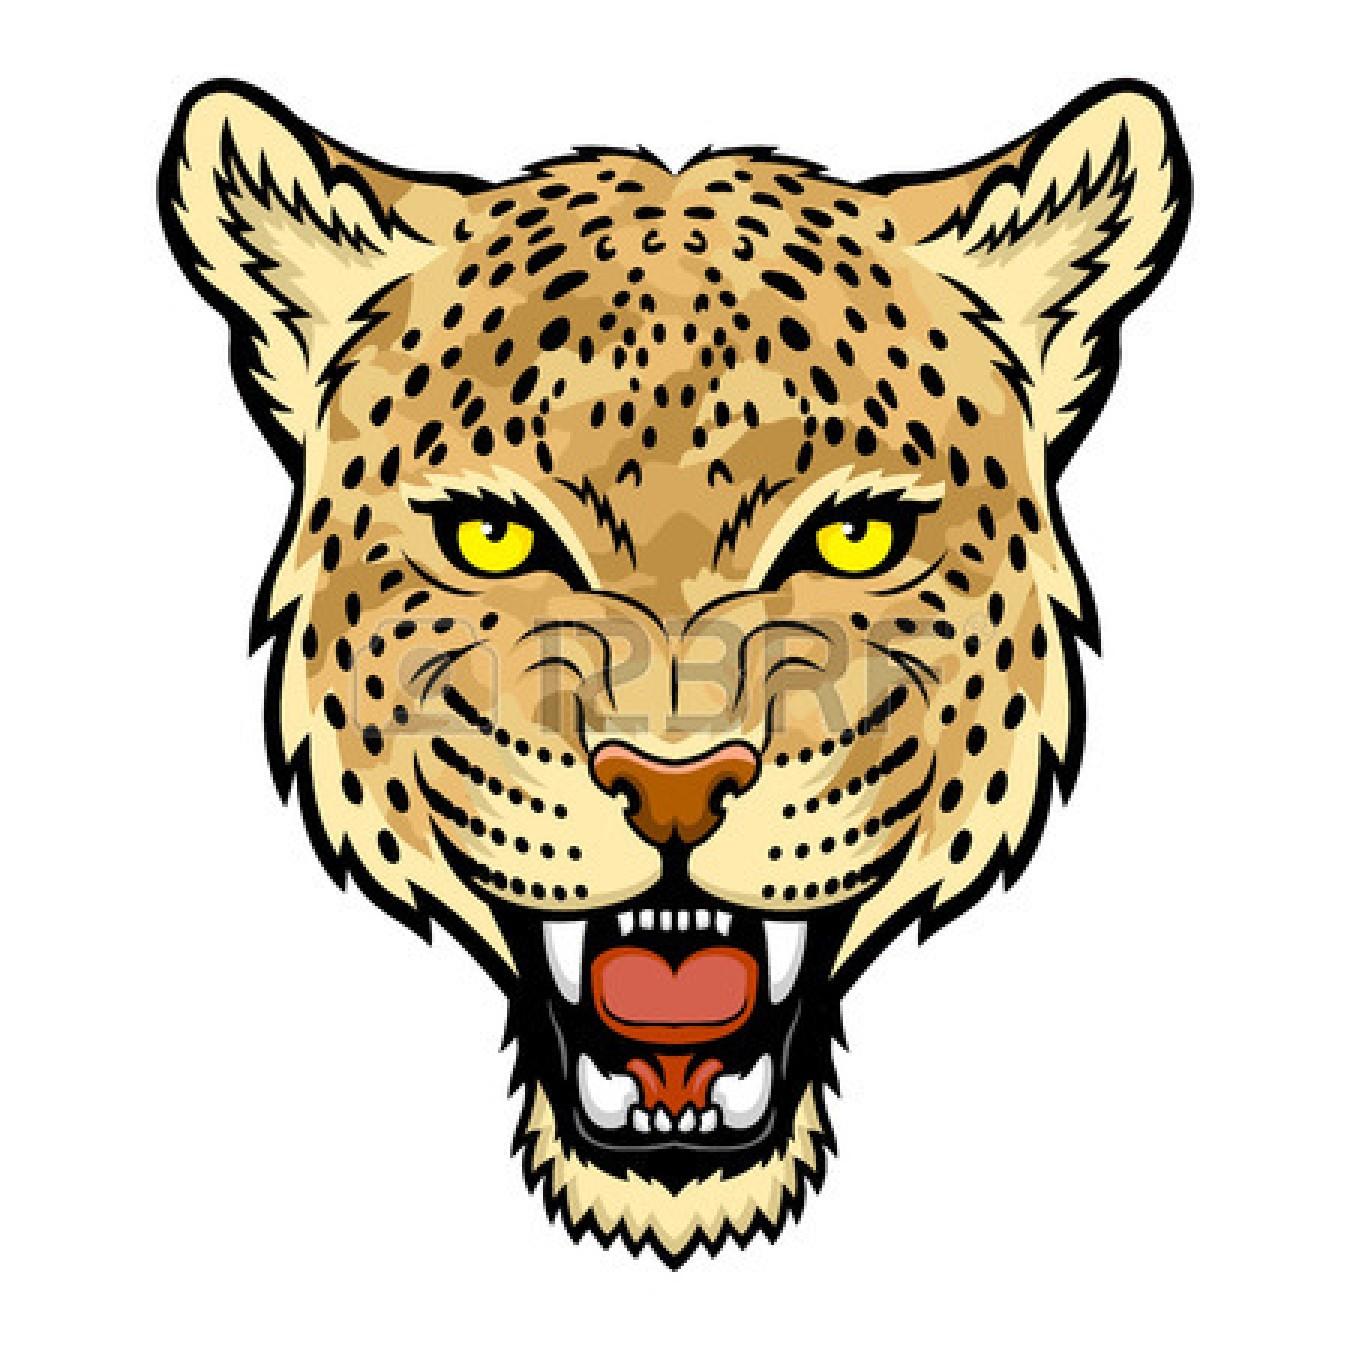 1350x1350 Top 85 Leopard Clipart